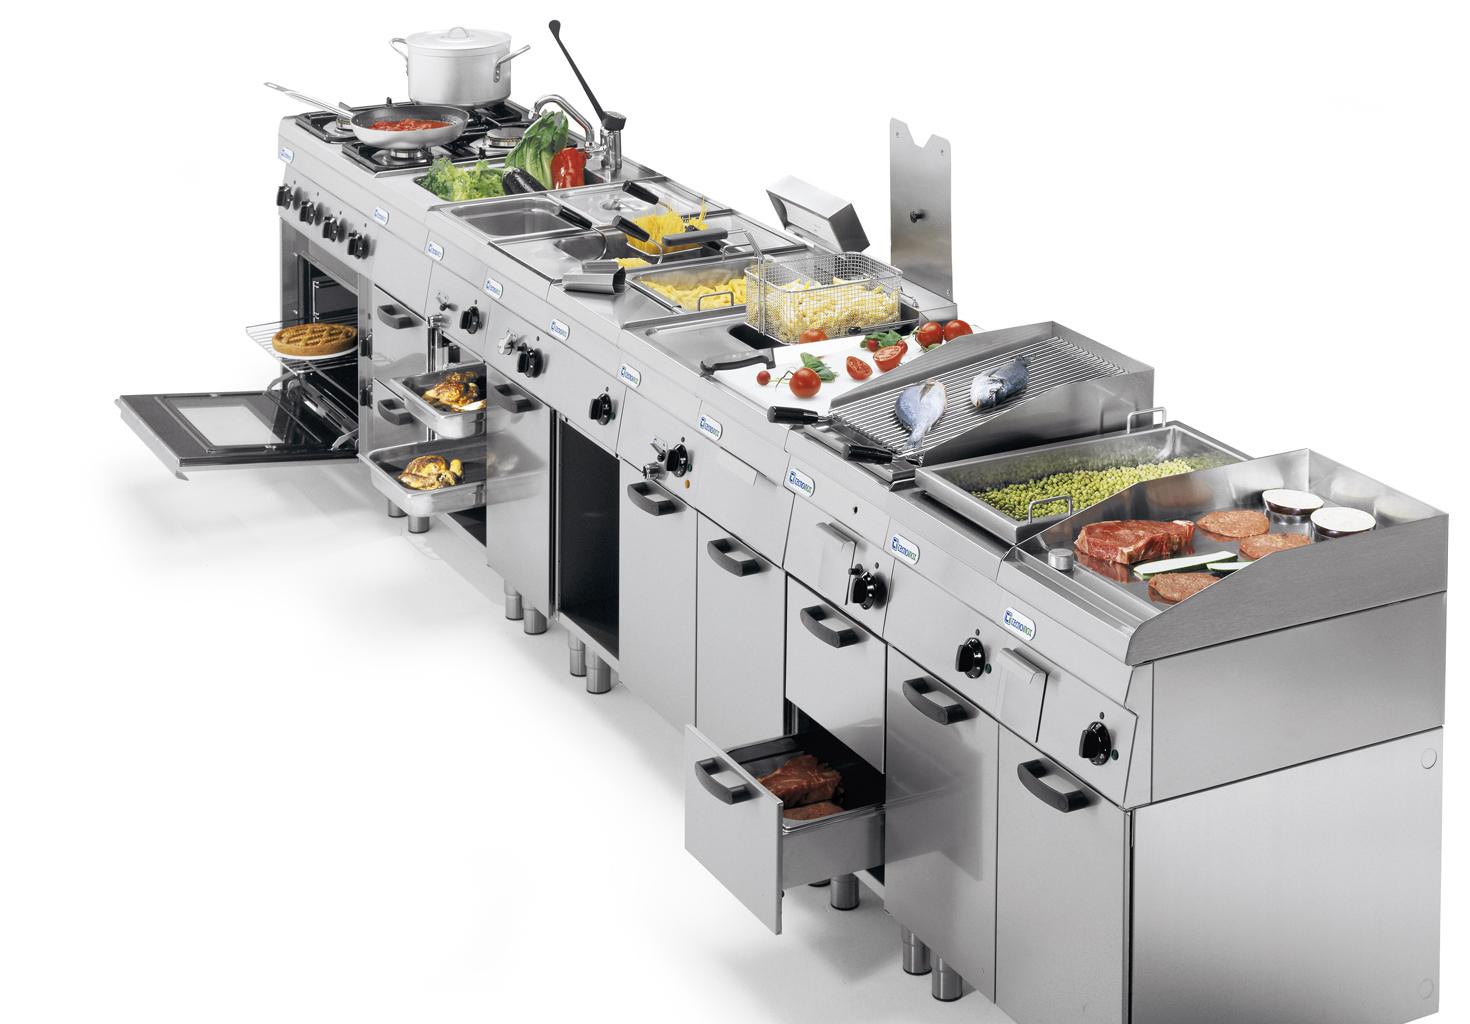 commercial restaurant equipment restaurant commercial kitchen commercial kitchen design equipment hoods sinks messagenote